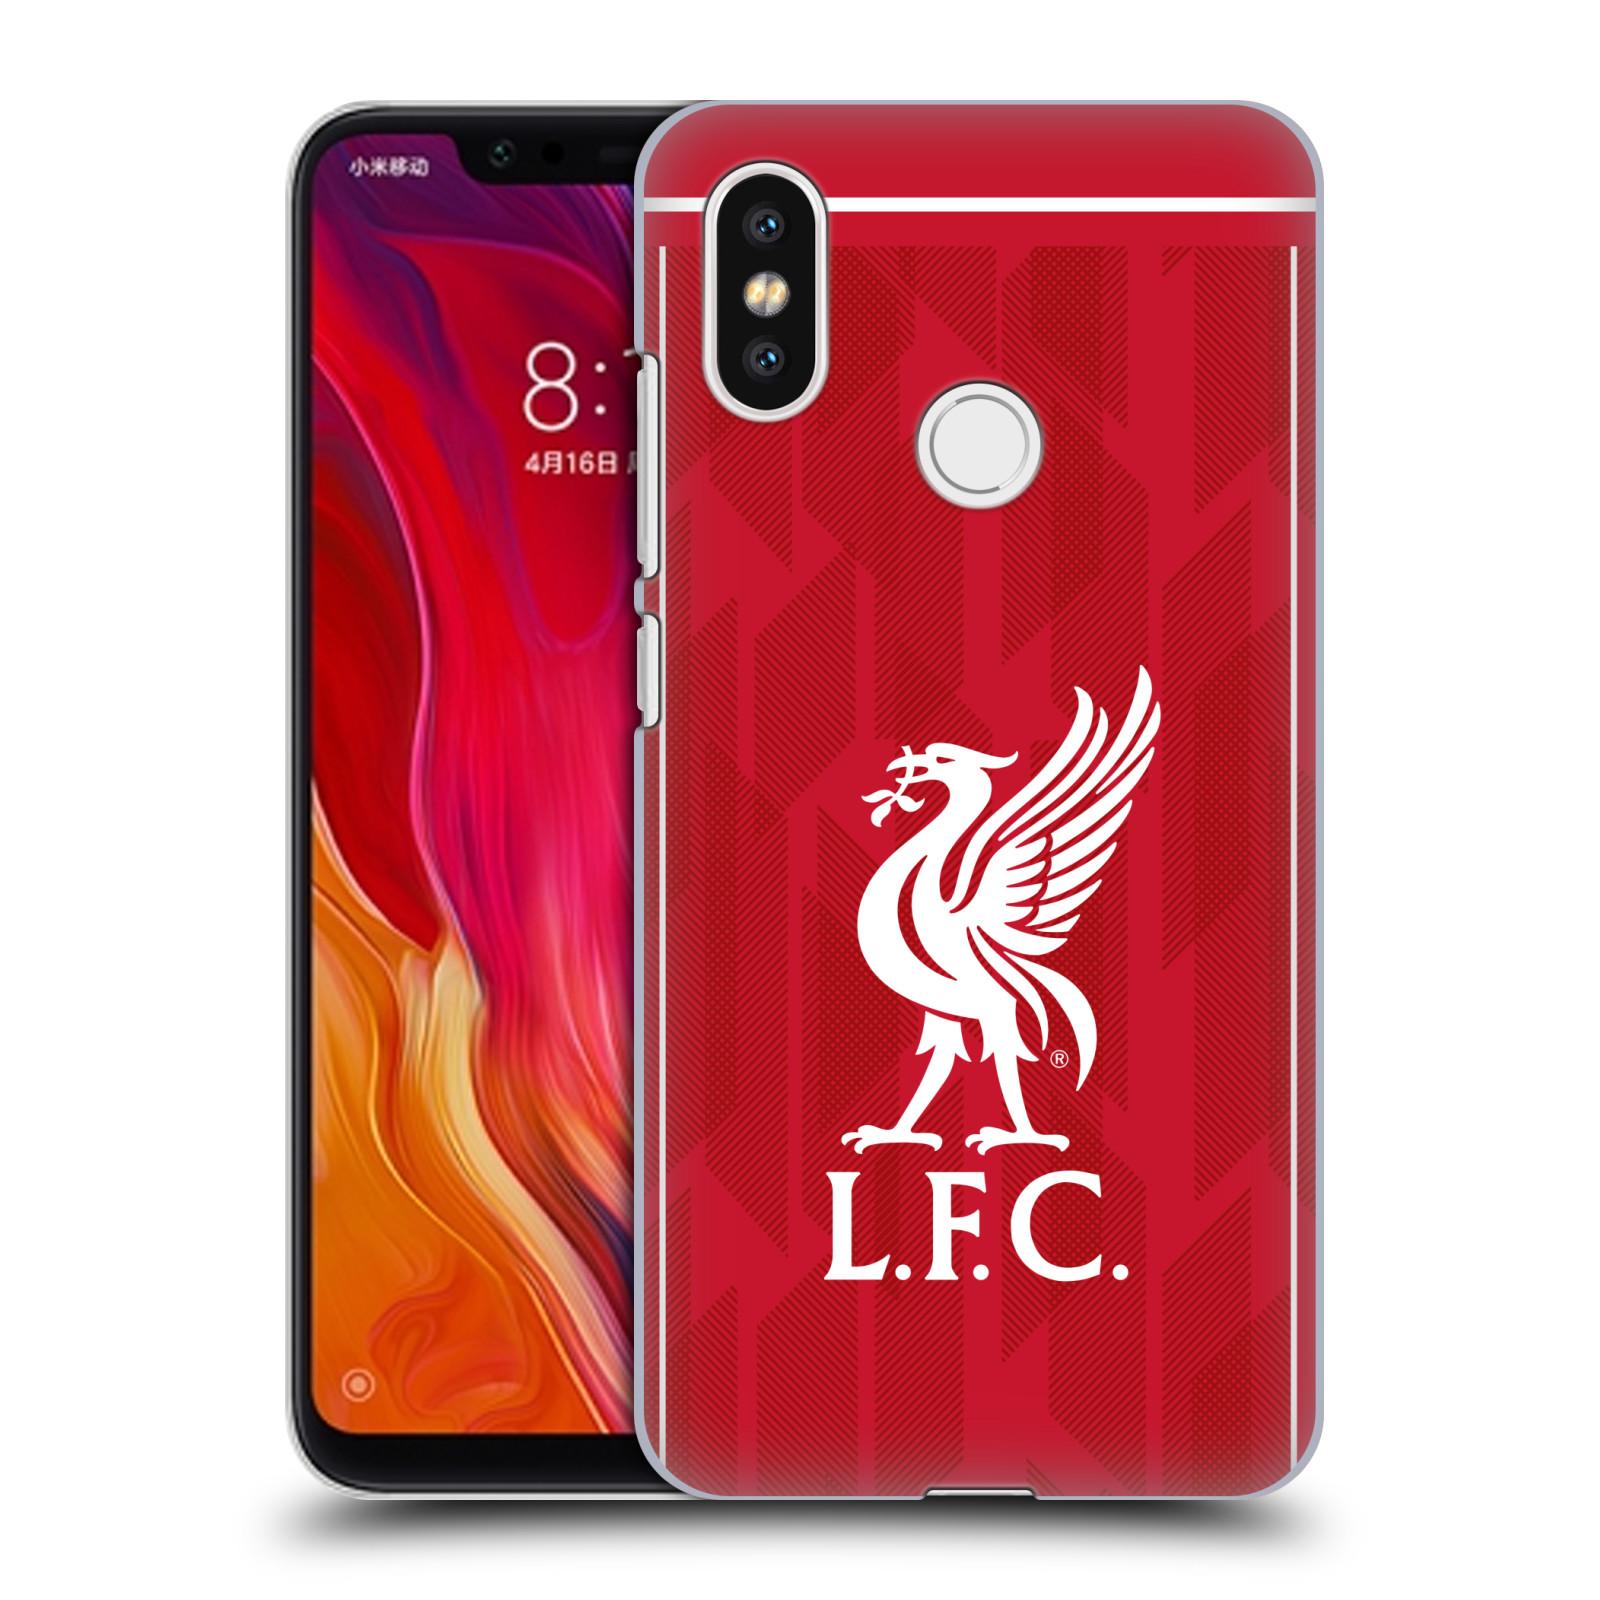 Plastové pouzdro na mobil Xiaomi Mi8 - Head Case - Liverpool FC - L.F.C. Home kit